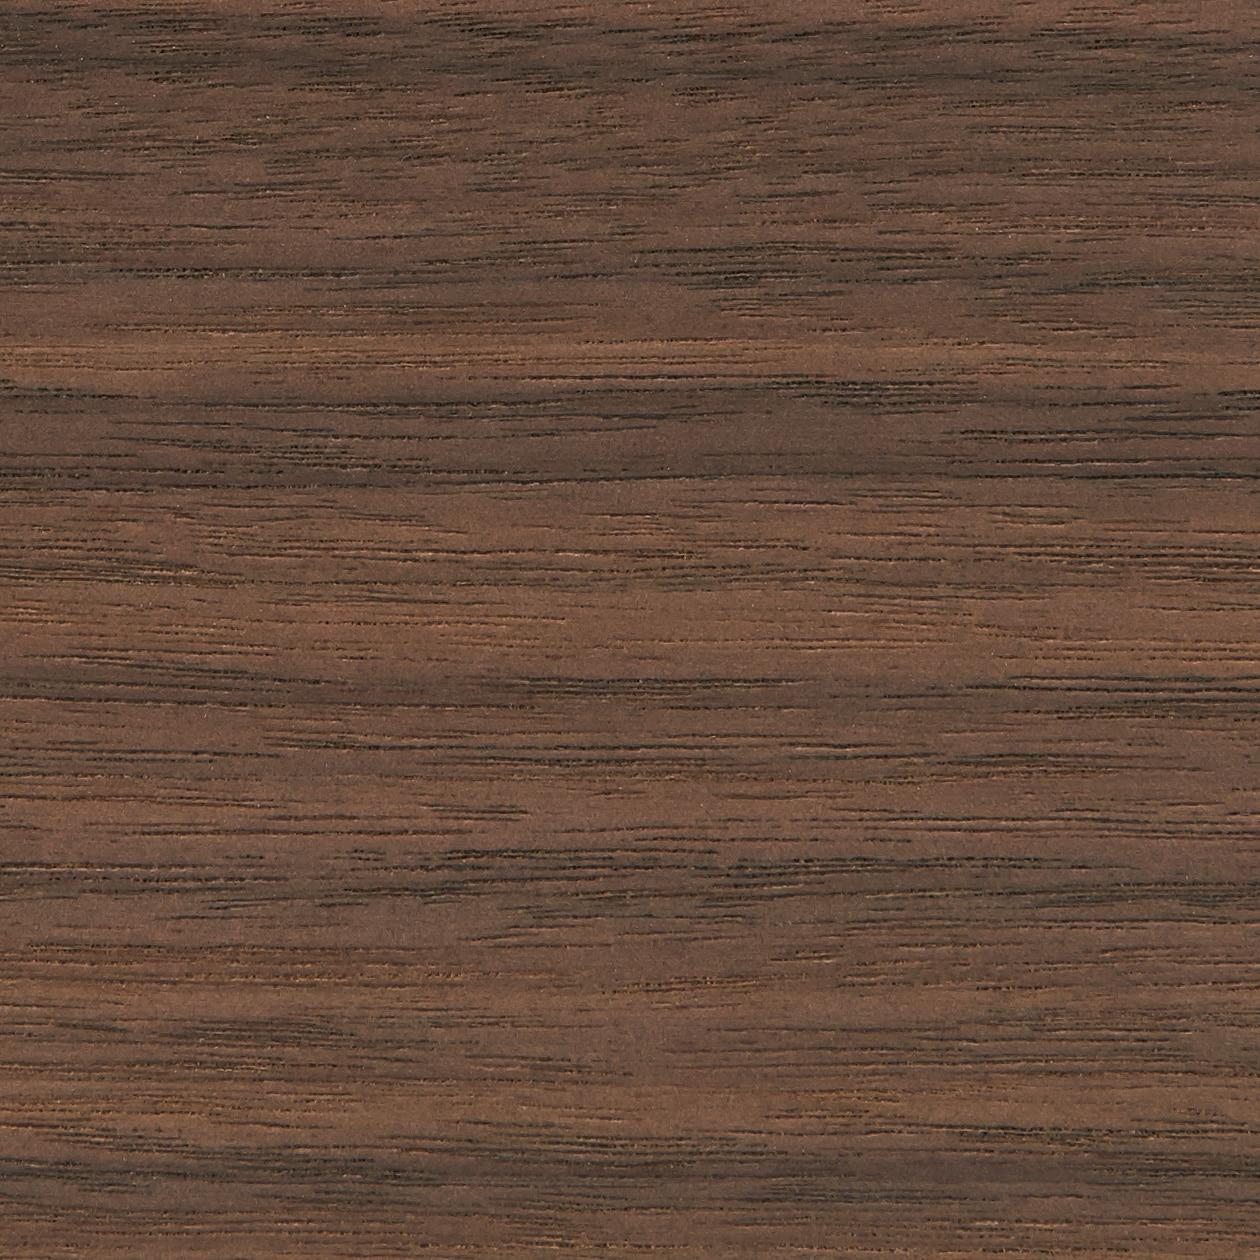 Walnut Wood Chest 6 Layers DŽ�印良品 Muji